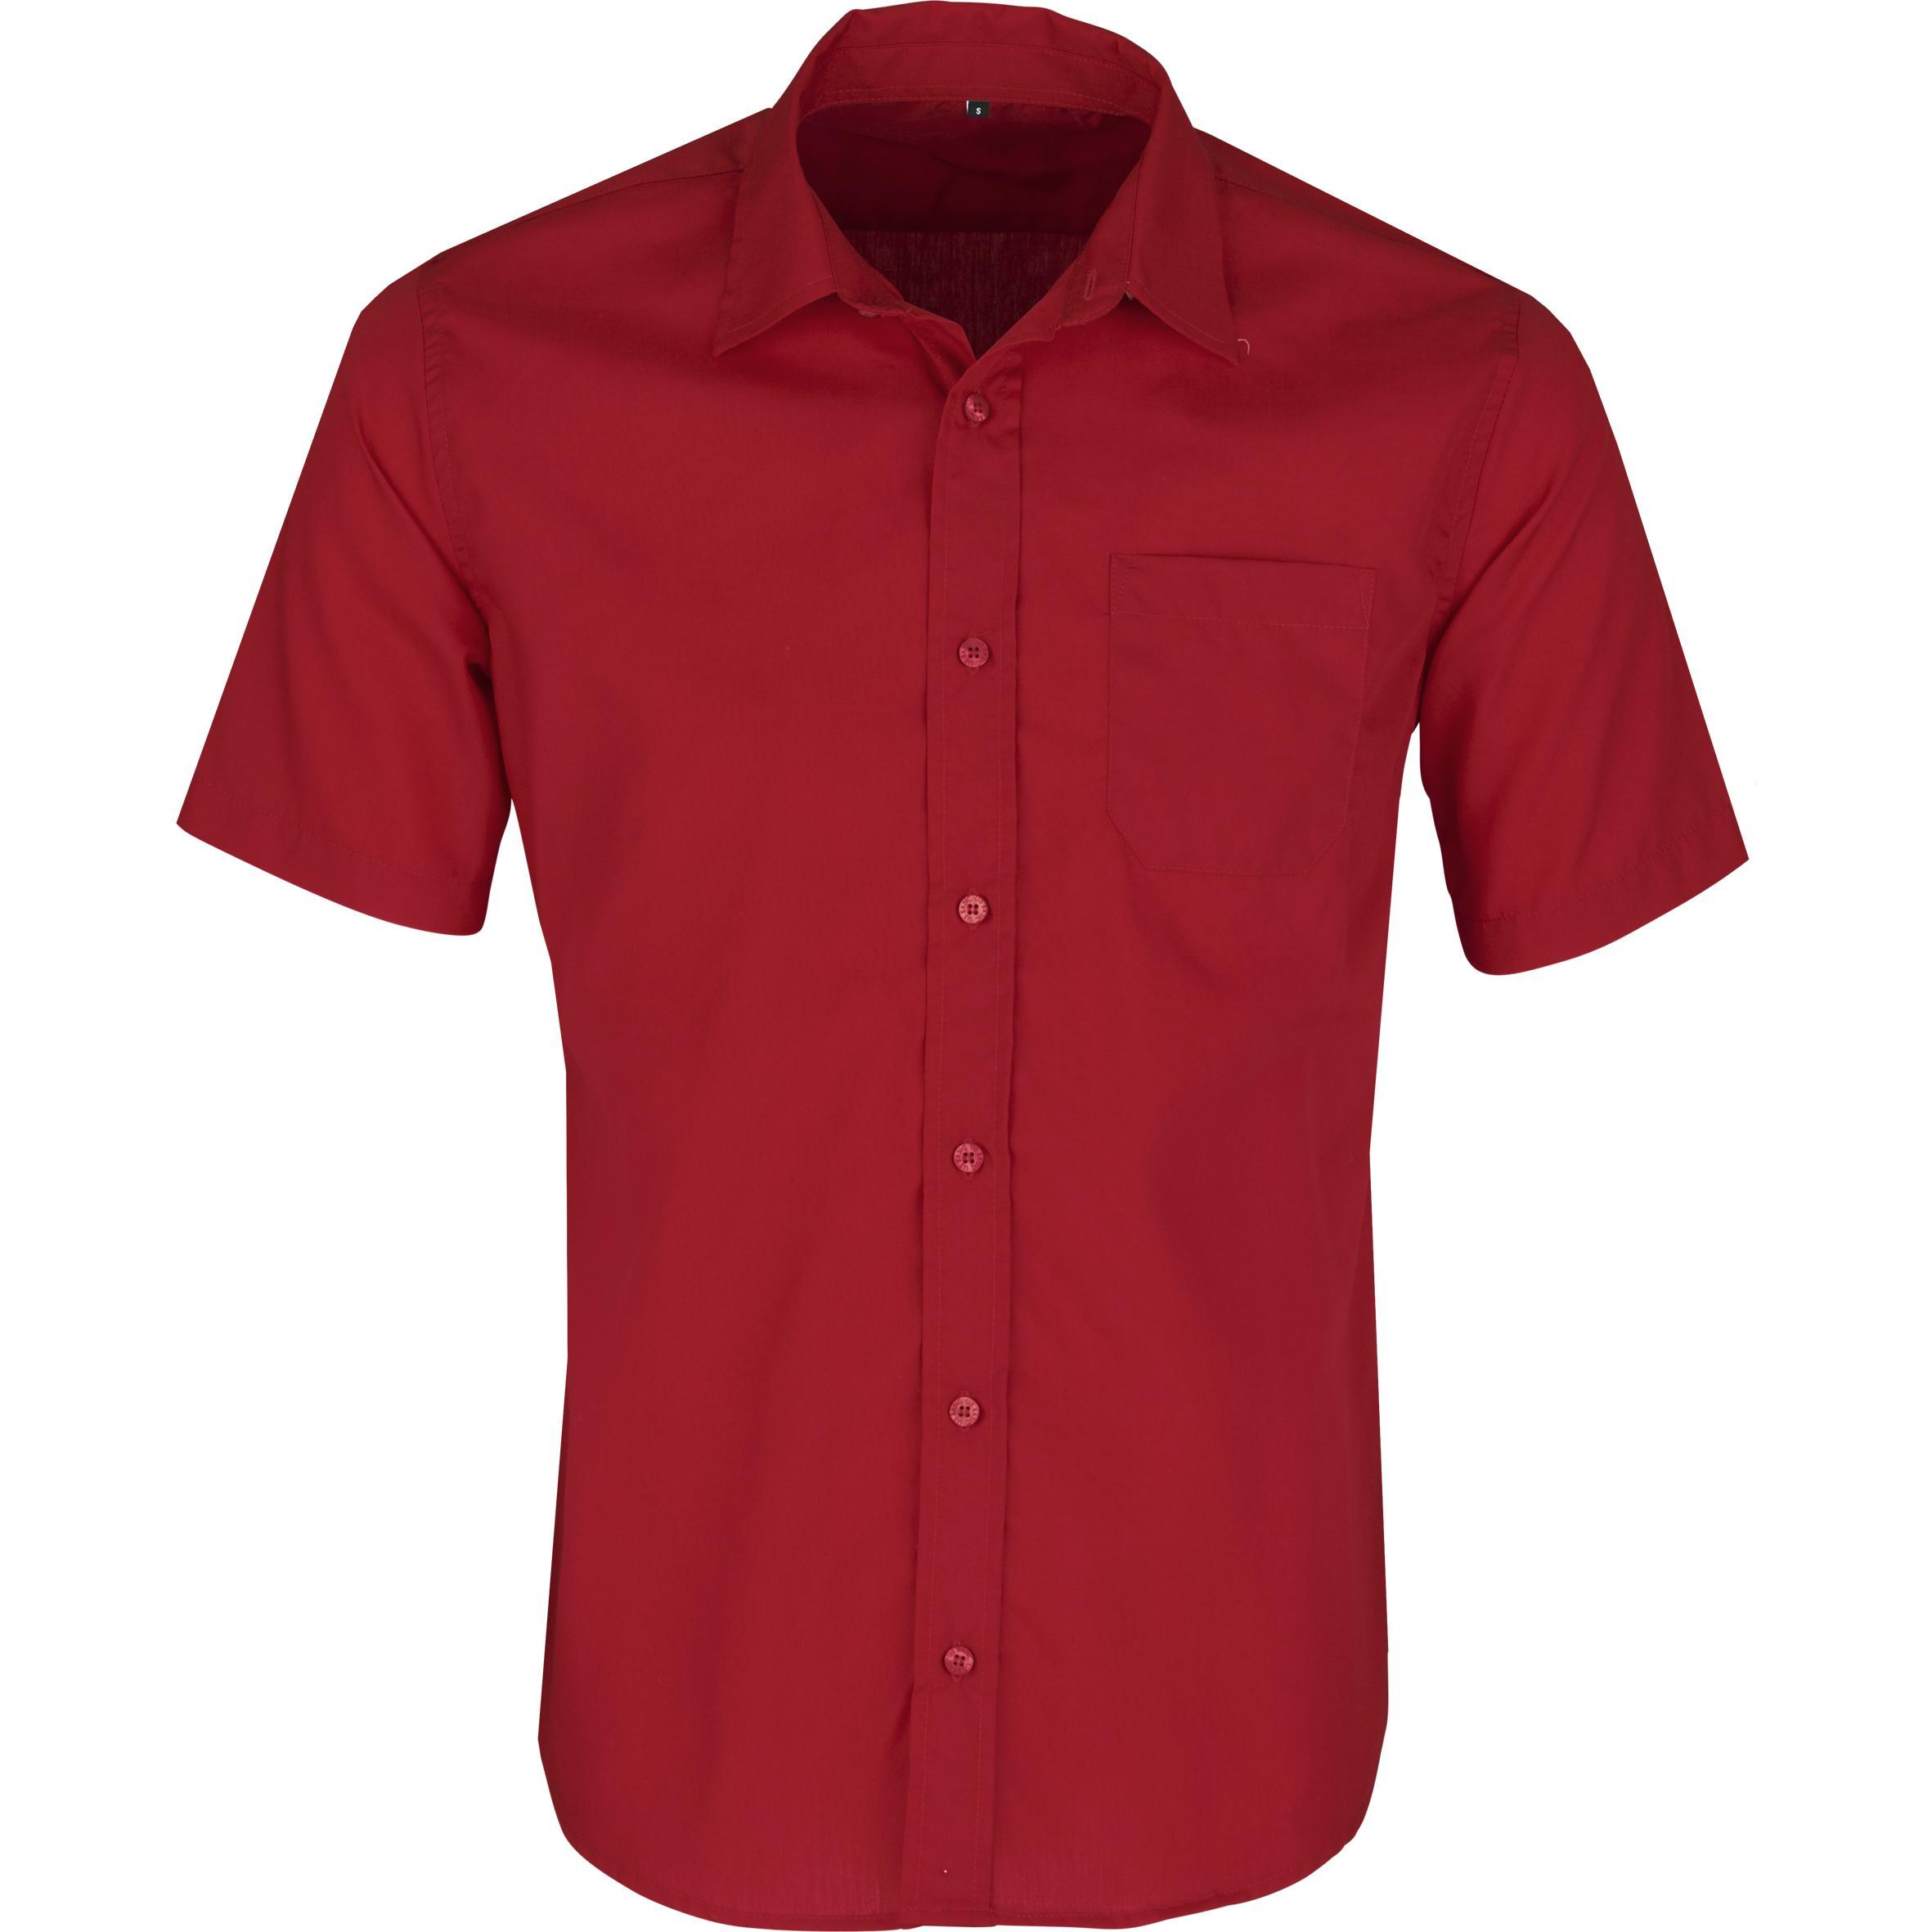 Mens Short Sleeve Kensington Shirt - Red Only